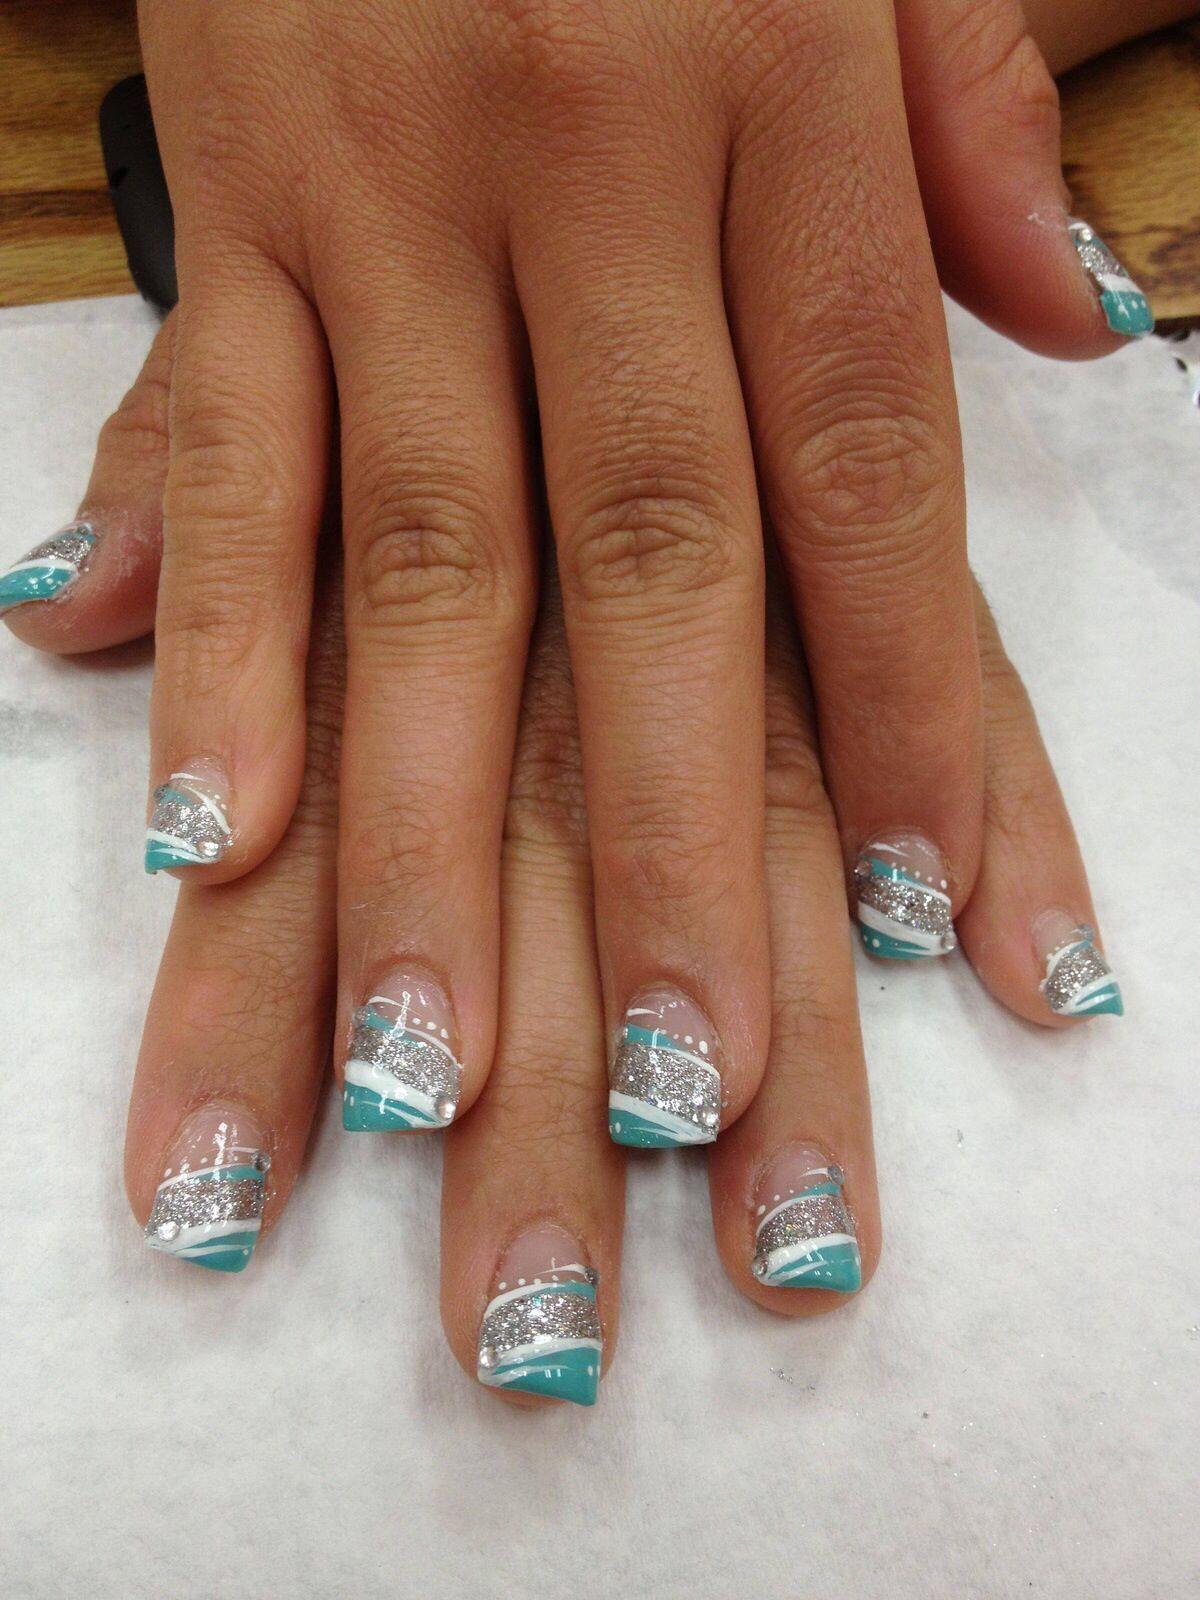 Pin by Aimee Buford on Beauty | Pinterest | Makeup, Nail nail and ...